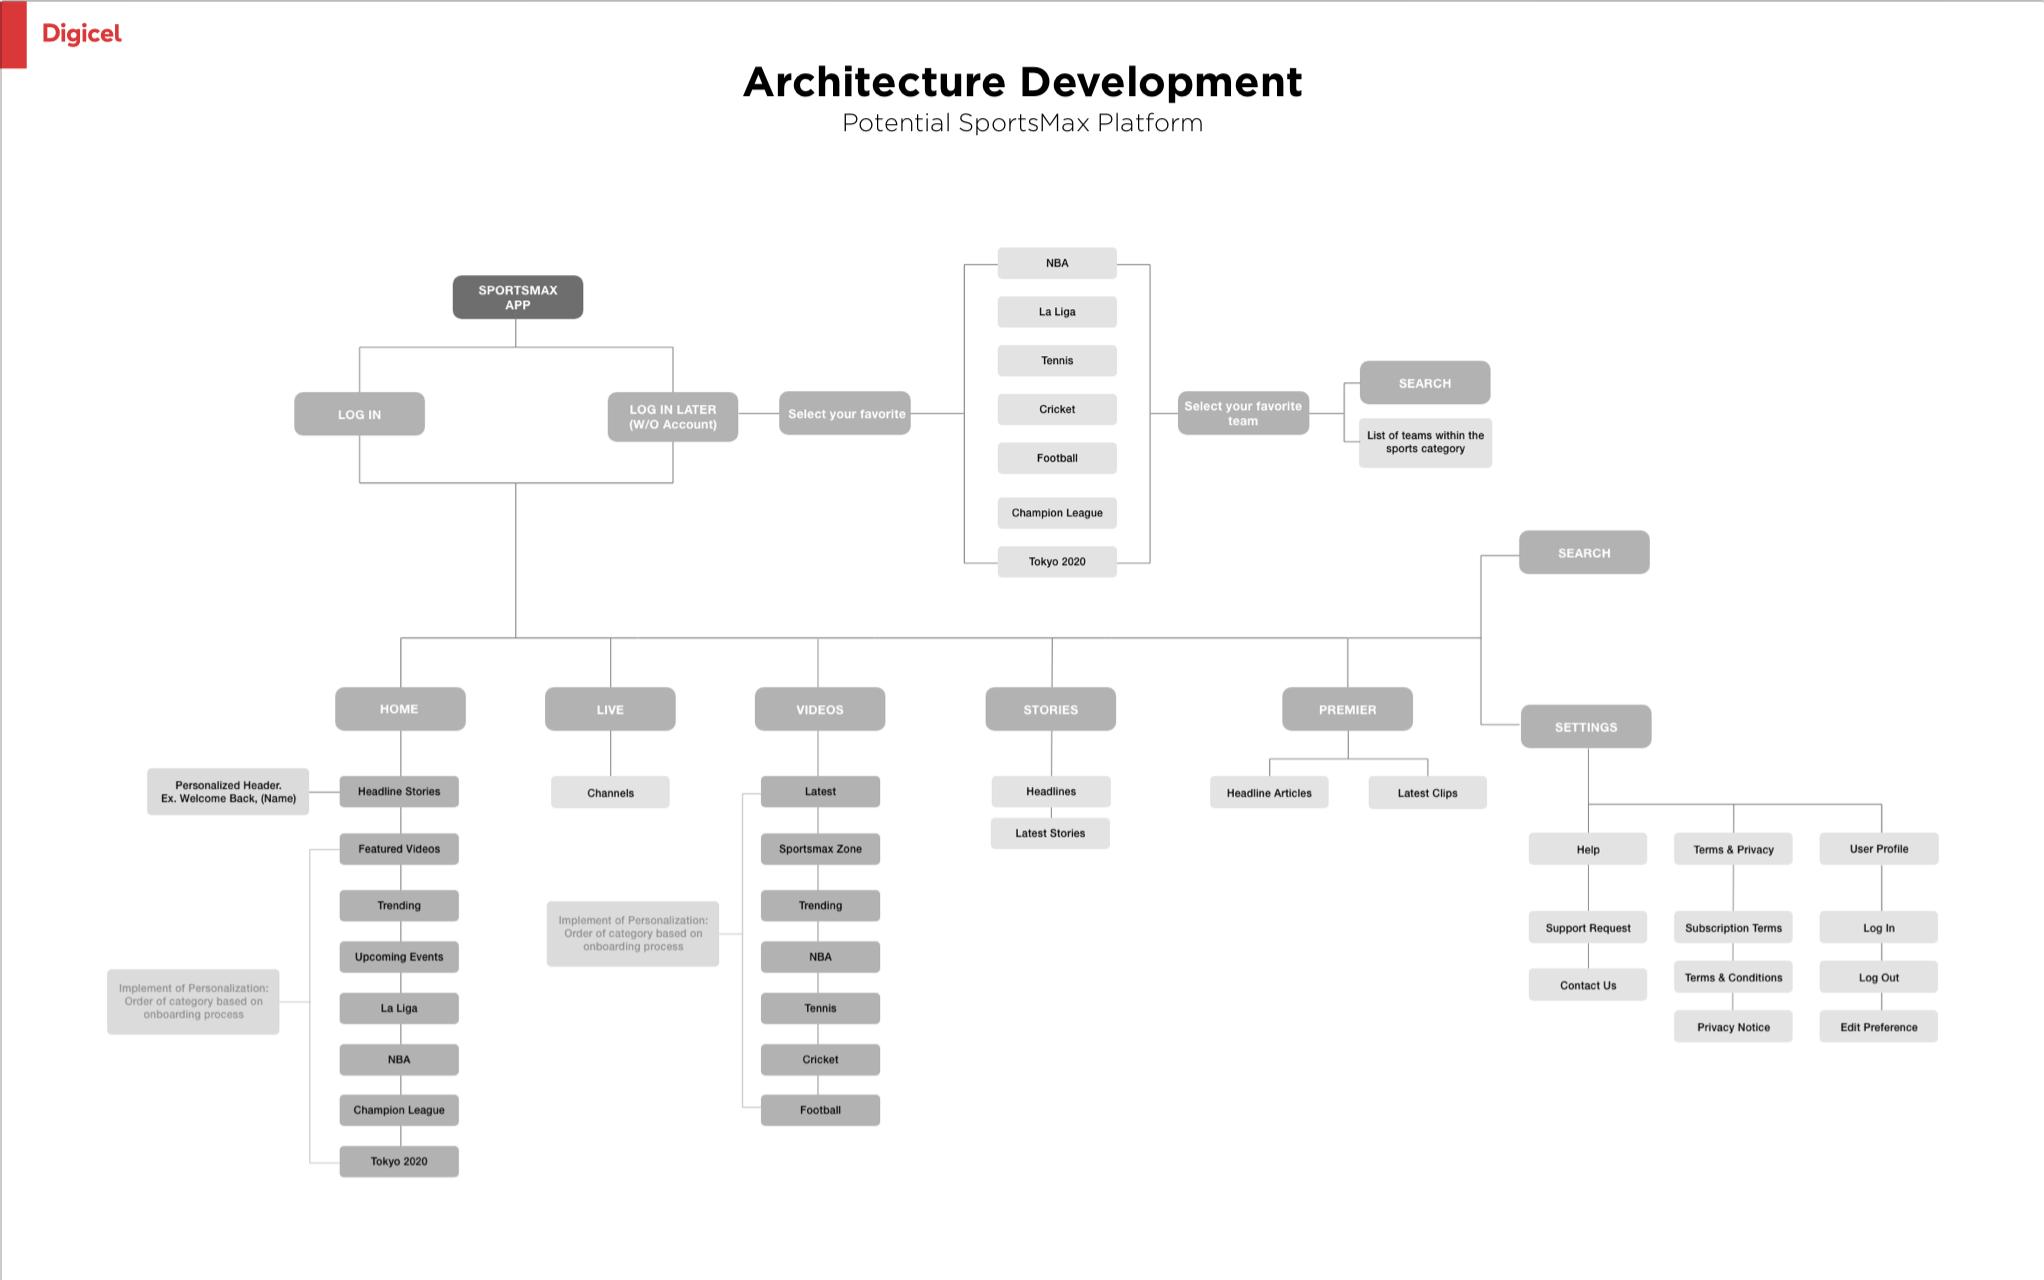 Potential SportsMax Platform Architecture